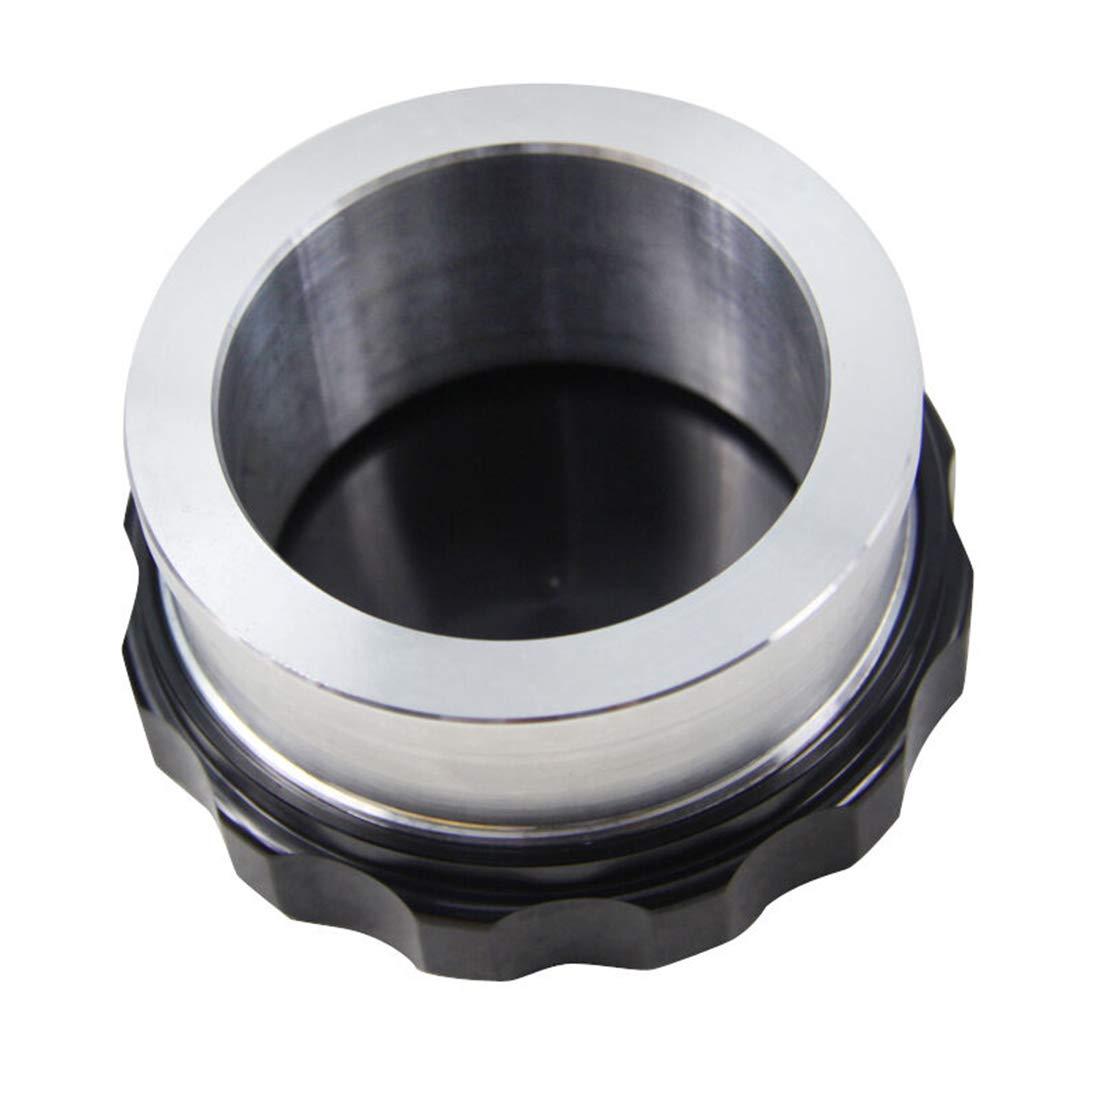 60mm Insert Weld On Screw Cap 1/'/' Inch Neck Filler Universal